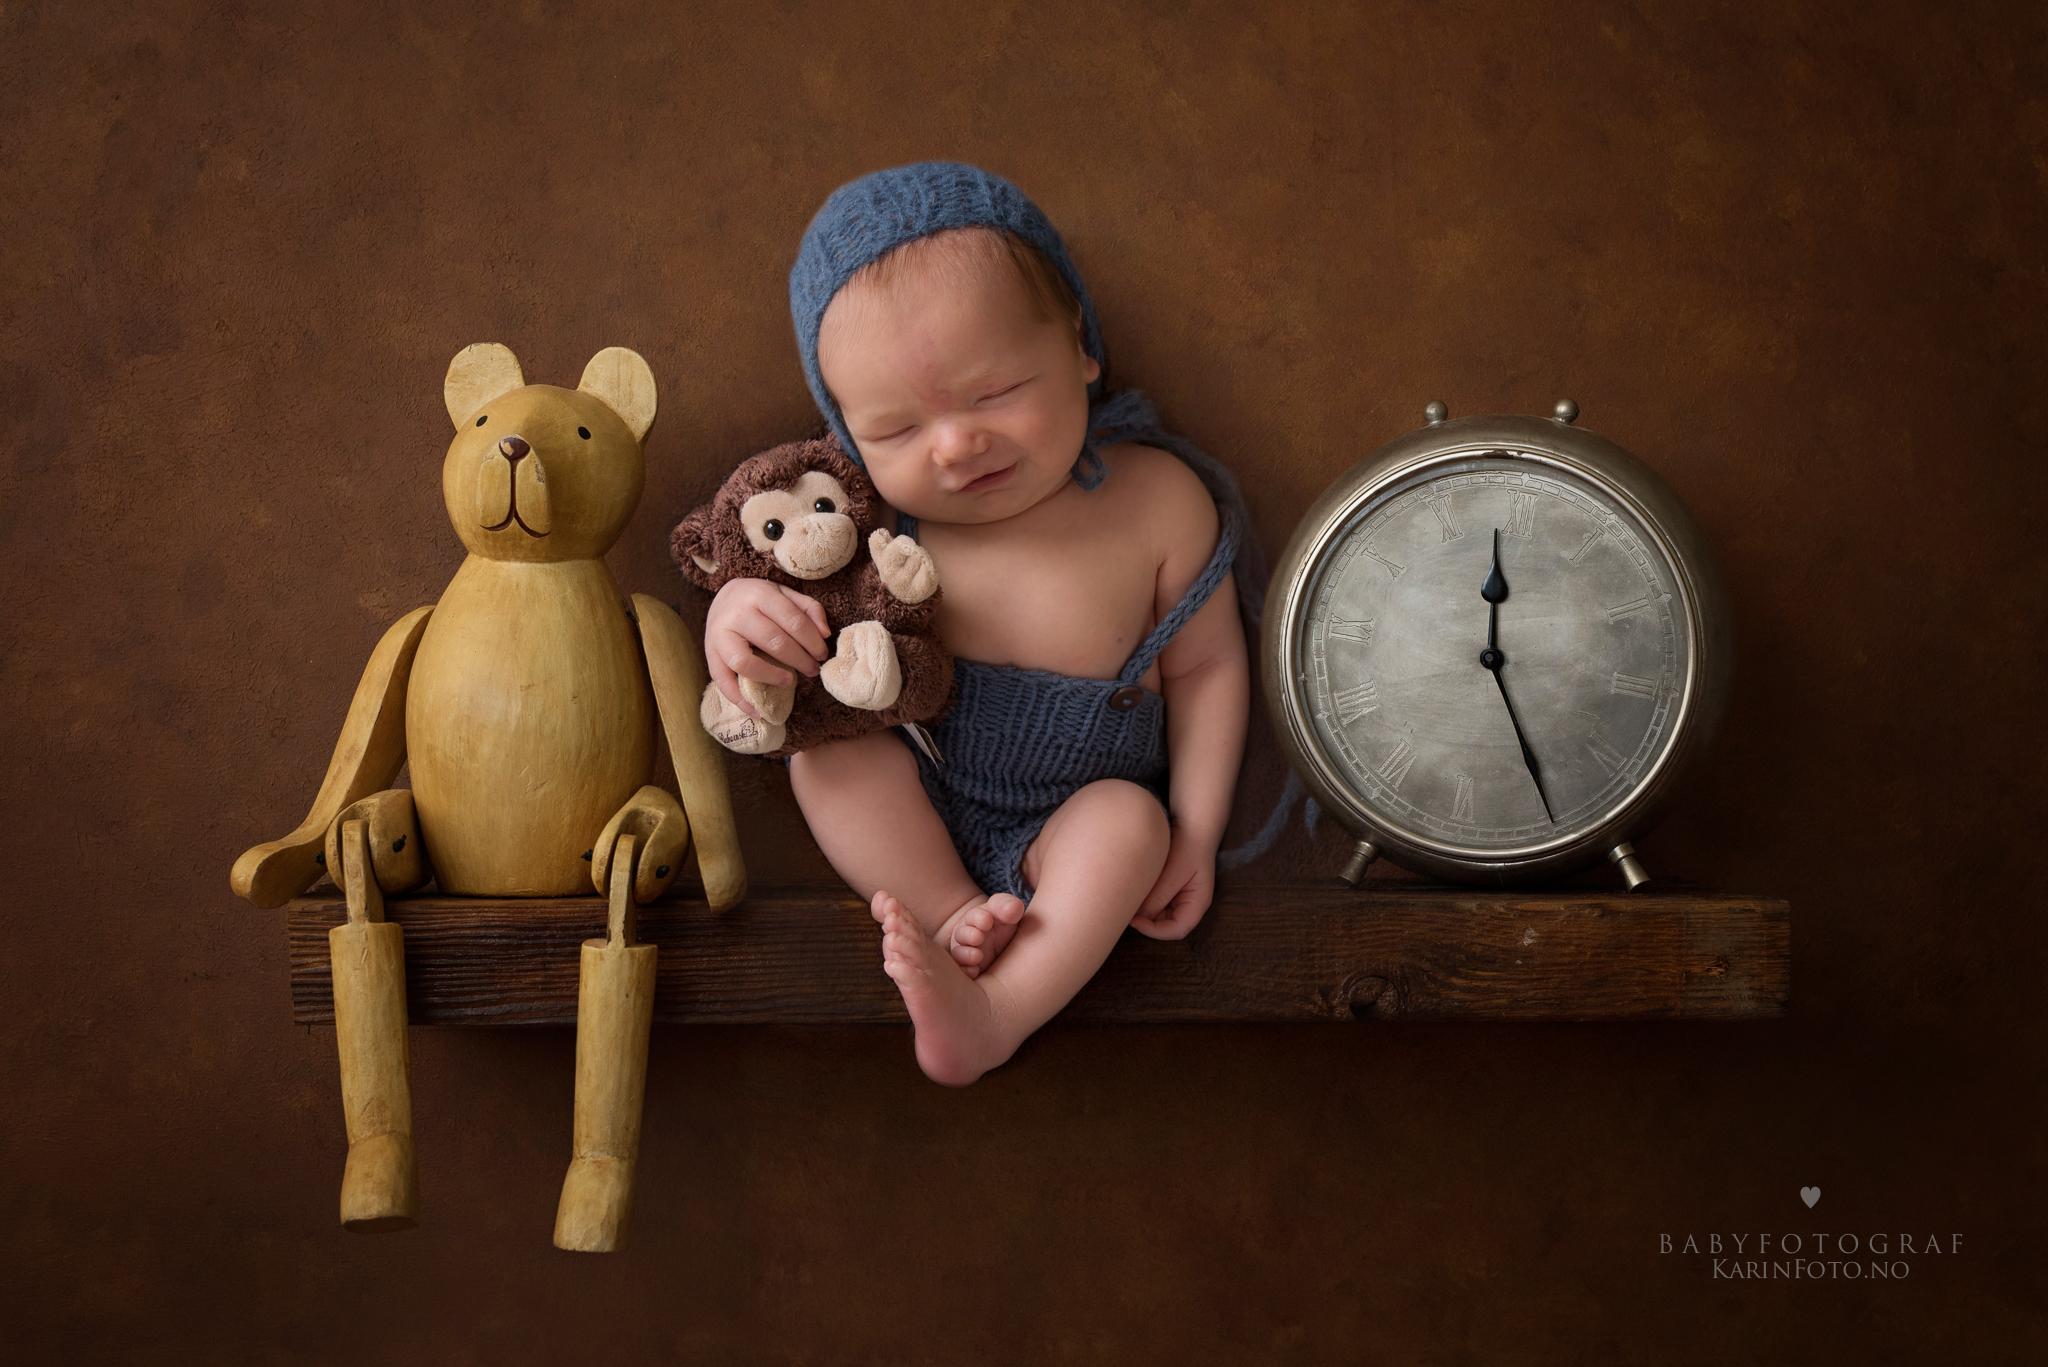 fineart,FotografKarinPedersen,nyfødtfoto,sovebilde,vintage